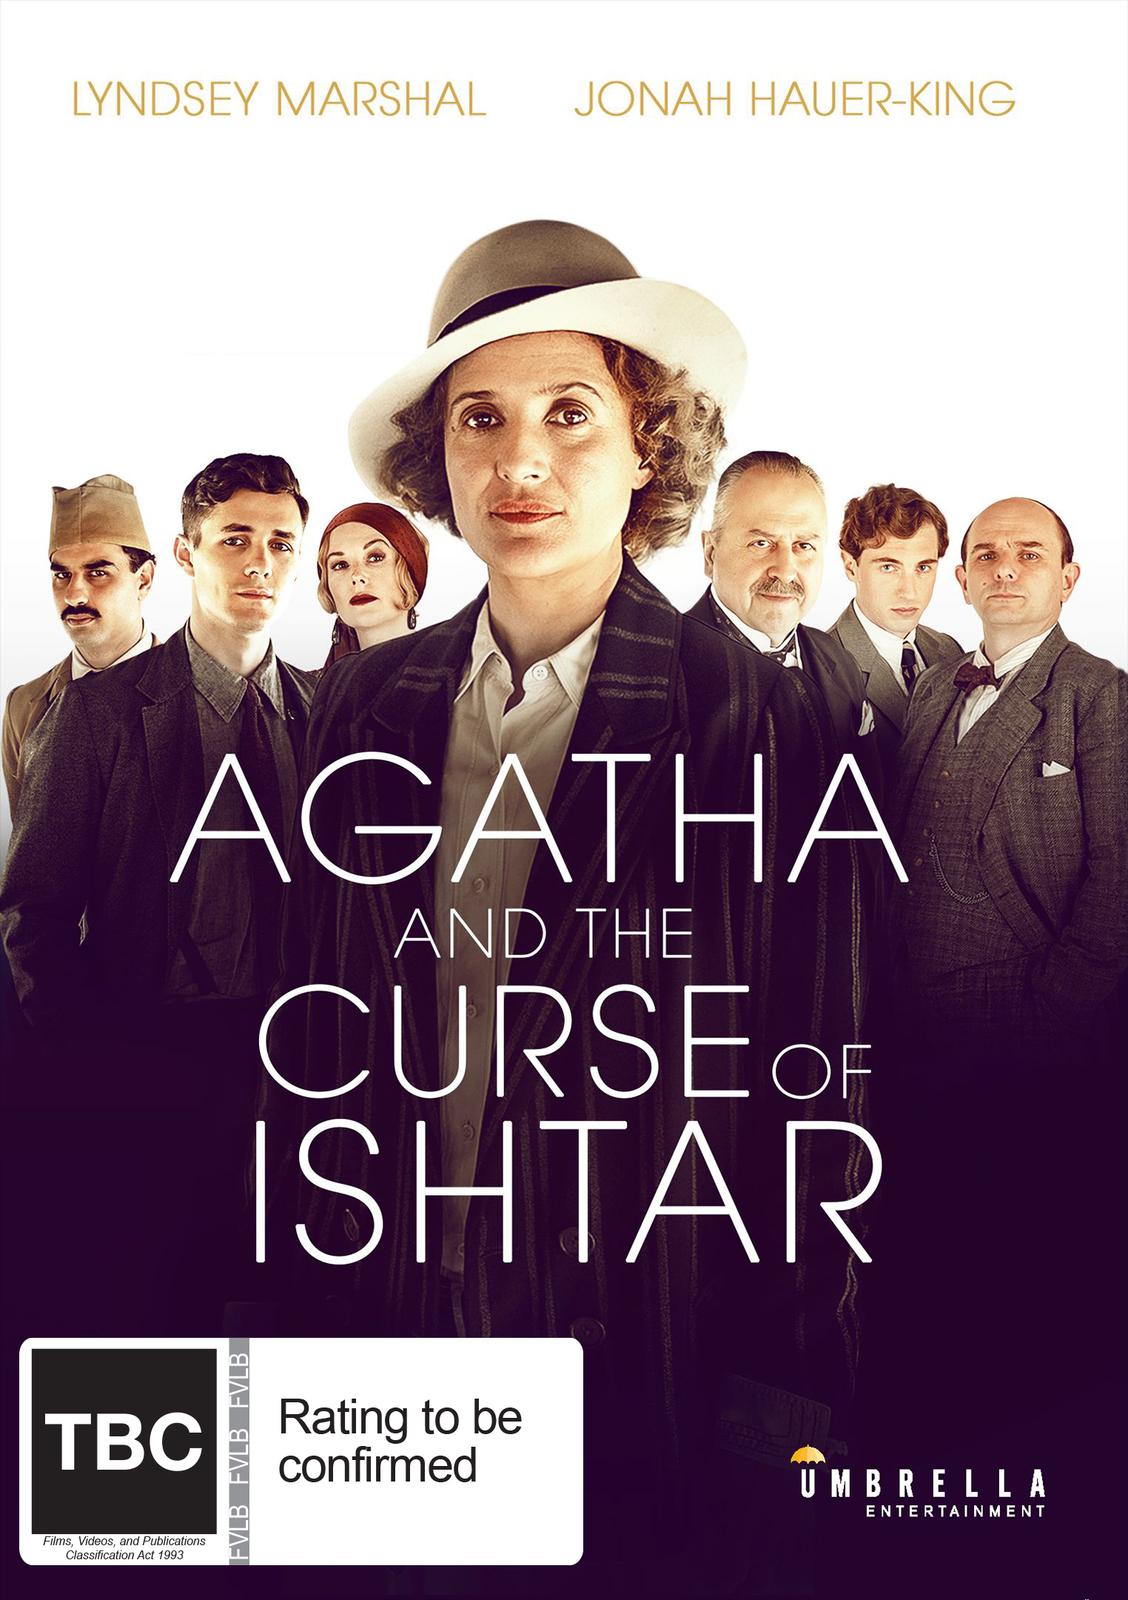 Agatha And The Curse Of Ishtar image